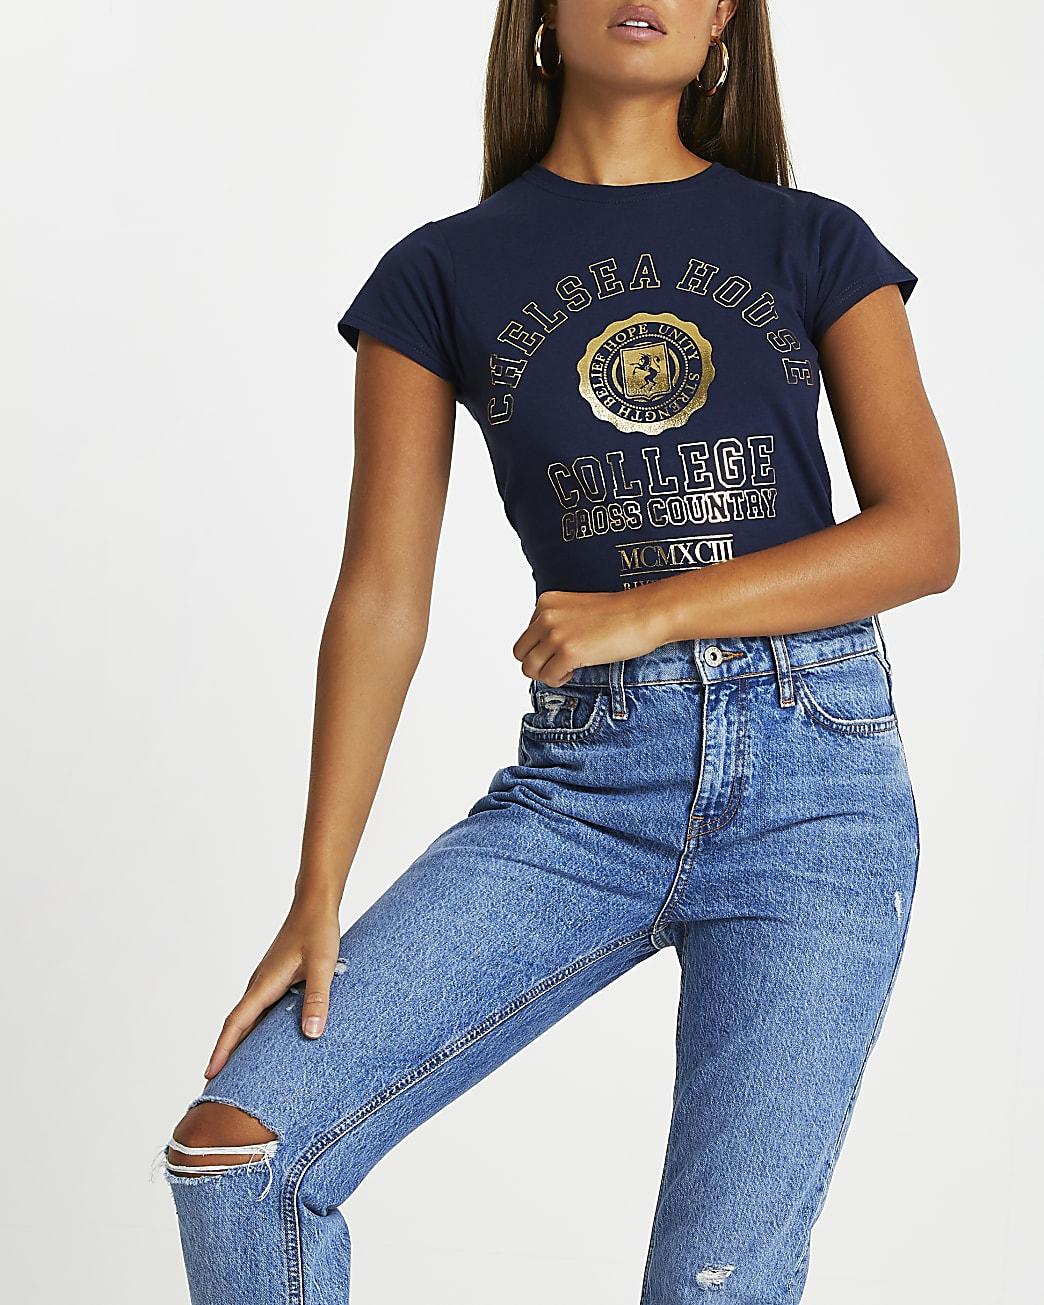 Navy 'Chelsea House' short sleeve t-shirt